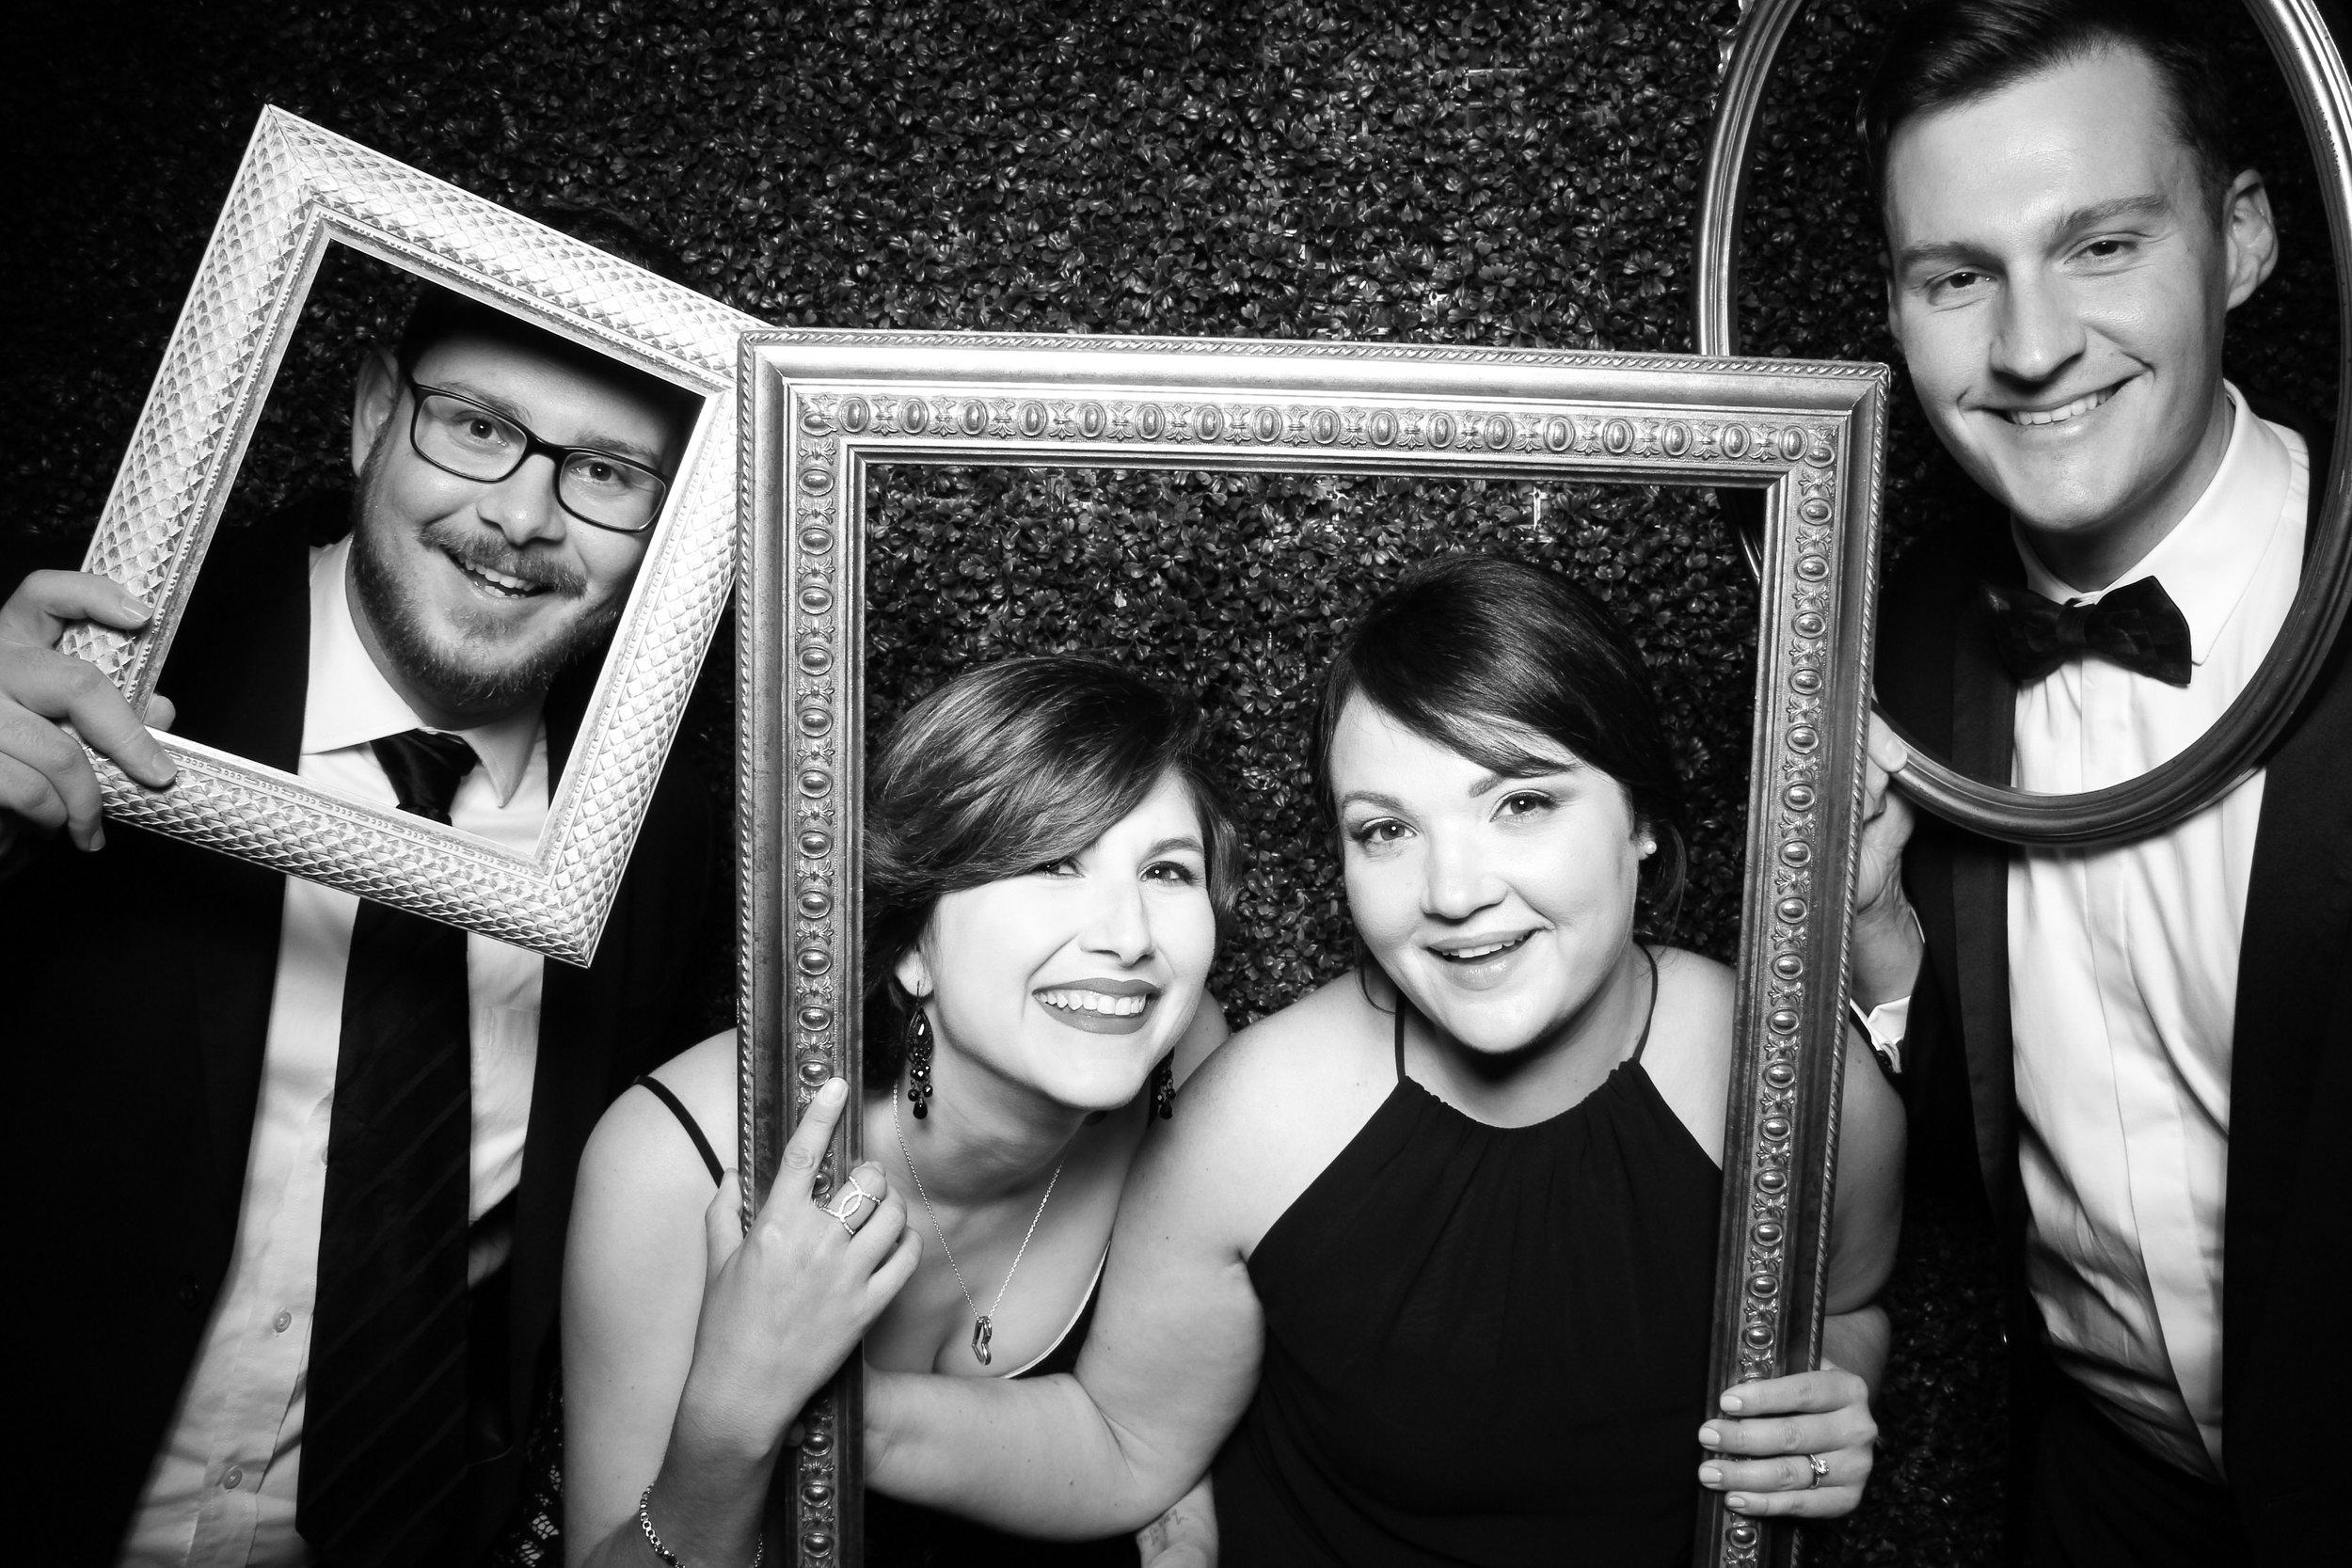 Ivy_Room_Chicago_Wedding_Reception_Photo_Booth_Rental__07.jpg